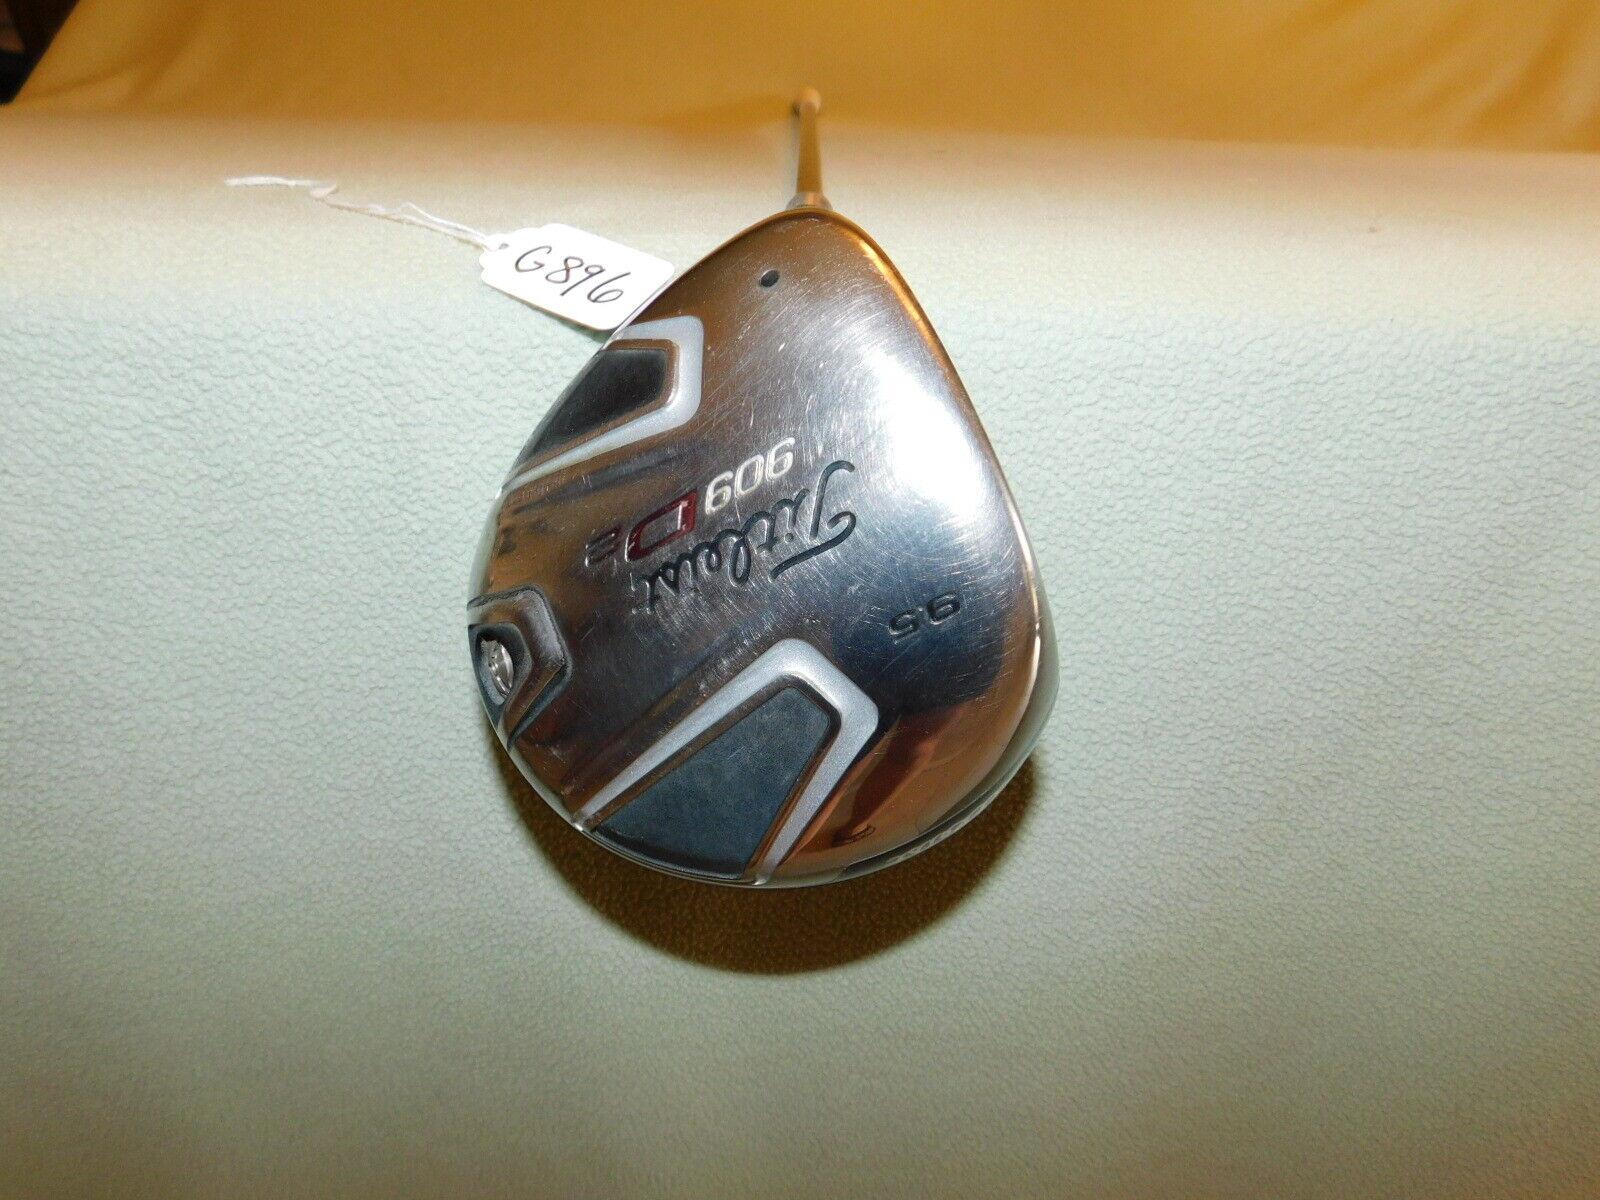 2009 zurdo Titleist 909 D2 rígido de la  flexión 9.5  Driver G896  80% de descuento